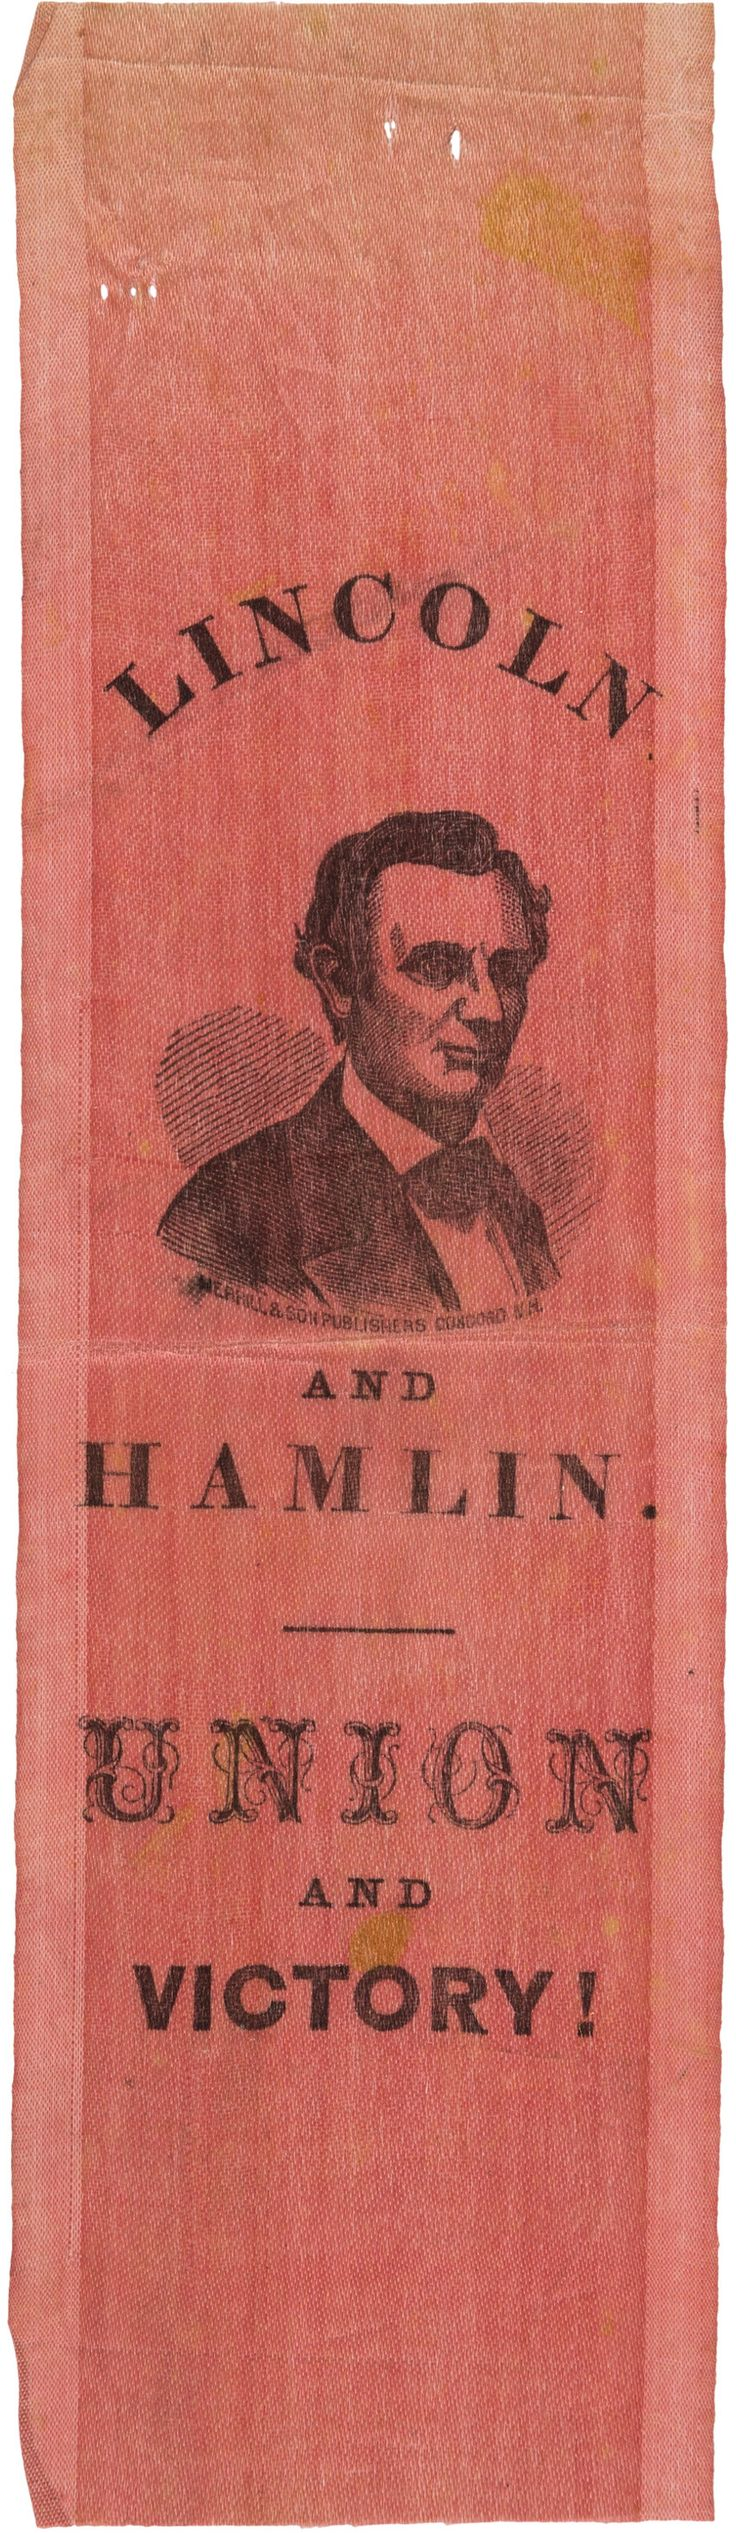 "Abraham Lincoln & Hannibal Hamlin Rose-Colored ""Union & Victory"" Presidential Campaign Silk Ribbon (1860) [$3,000 (2017)]"